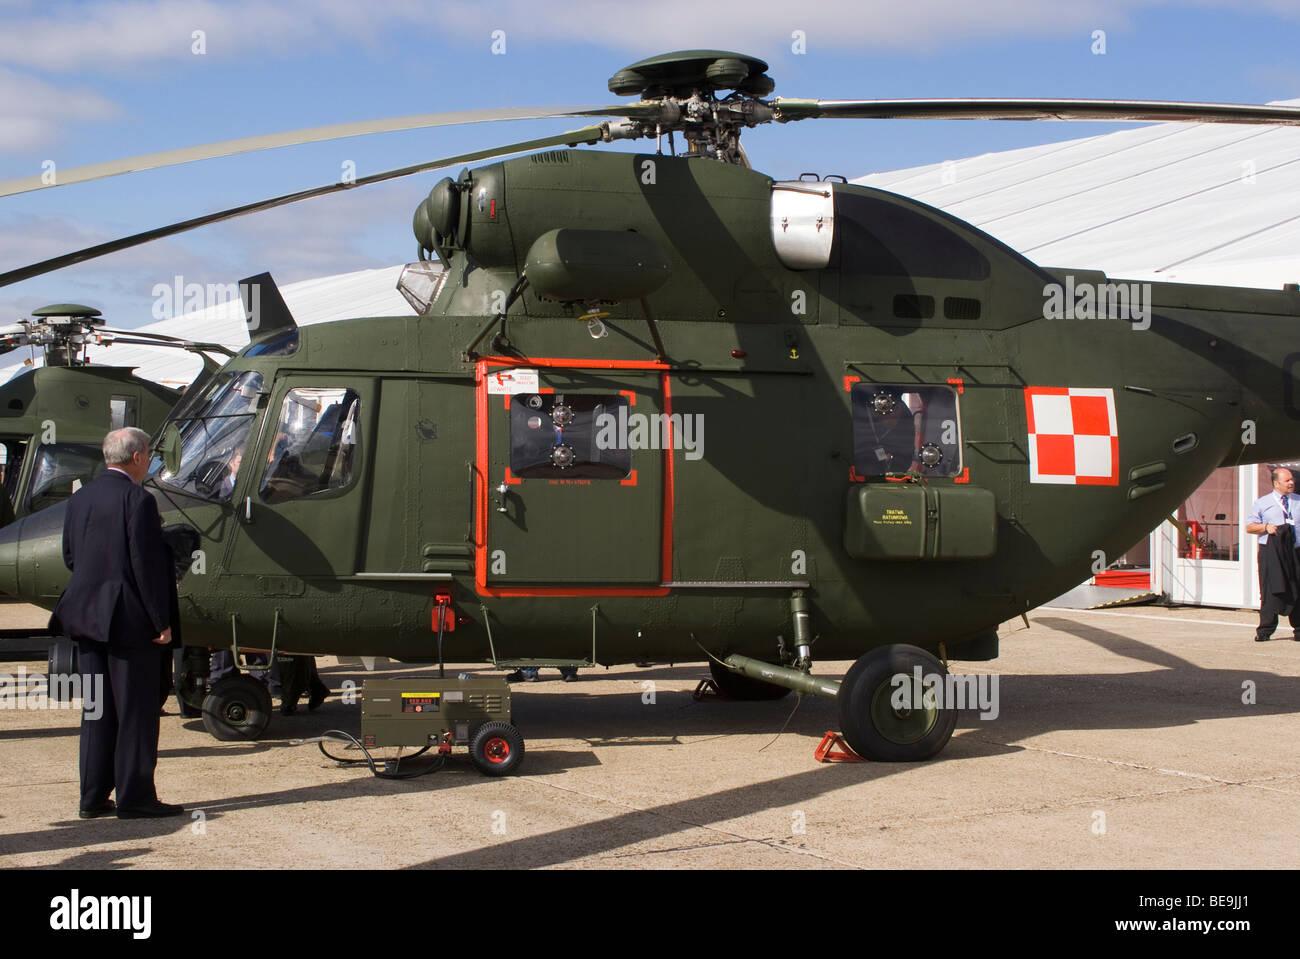 Polish Air Force PZL-Swidnik W-3 RL Sokol Helicopter 0417 at Helitech Duxford Aerodrome Cambridgeshire England United - Stock Image